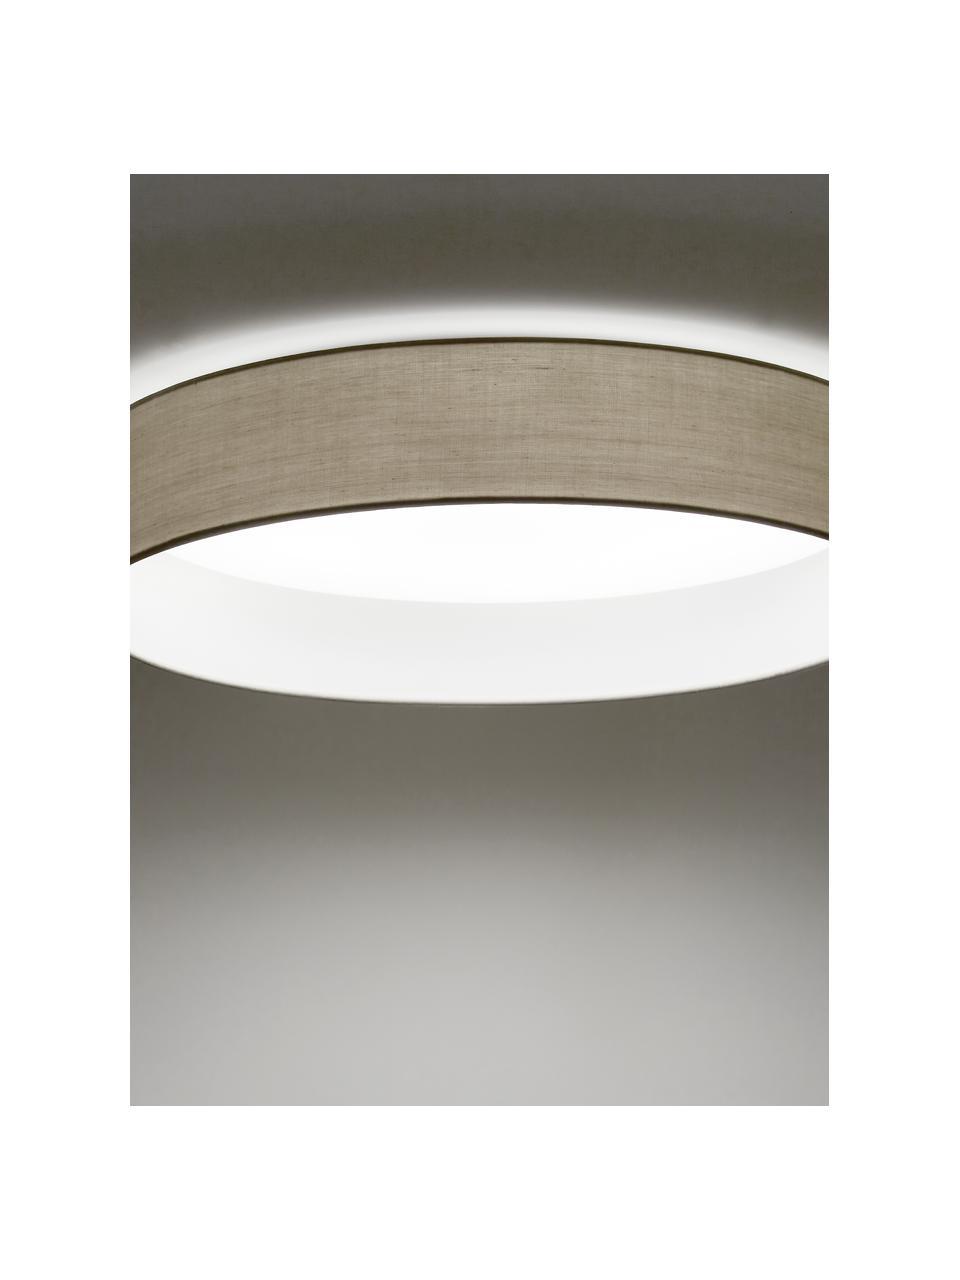 LED-Deckenleuchte Helen in Taupe, Diffusorscheibe: Kunststoff, Taupe, Ø 52 x H 11 cm